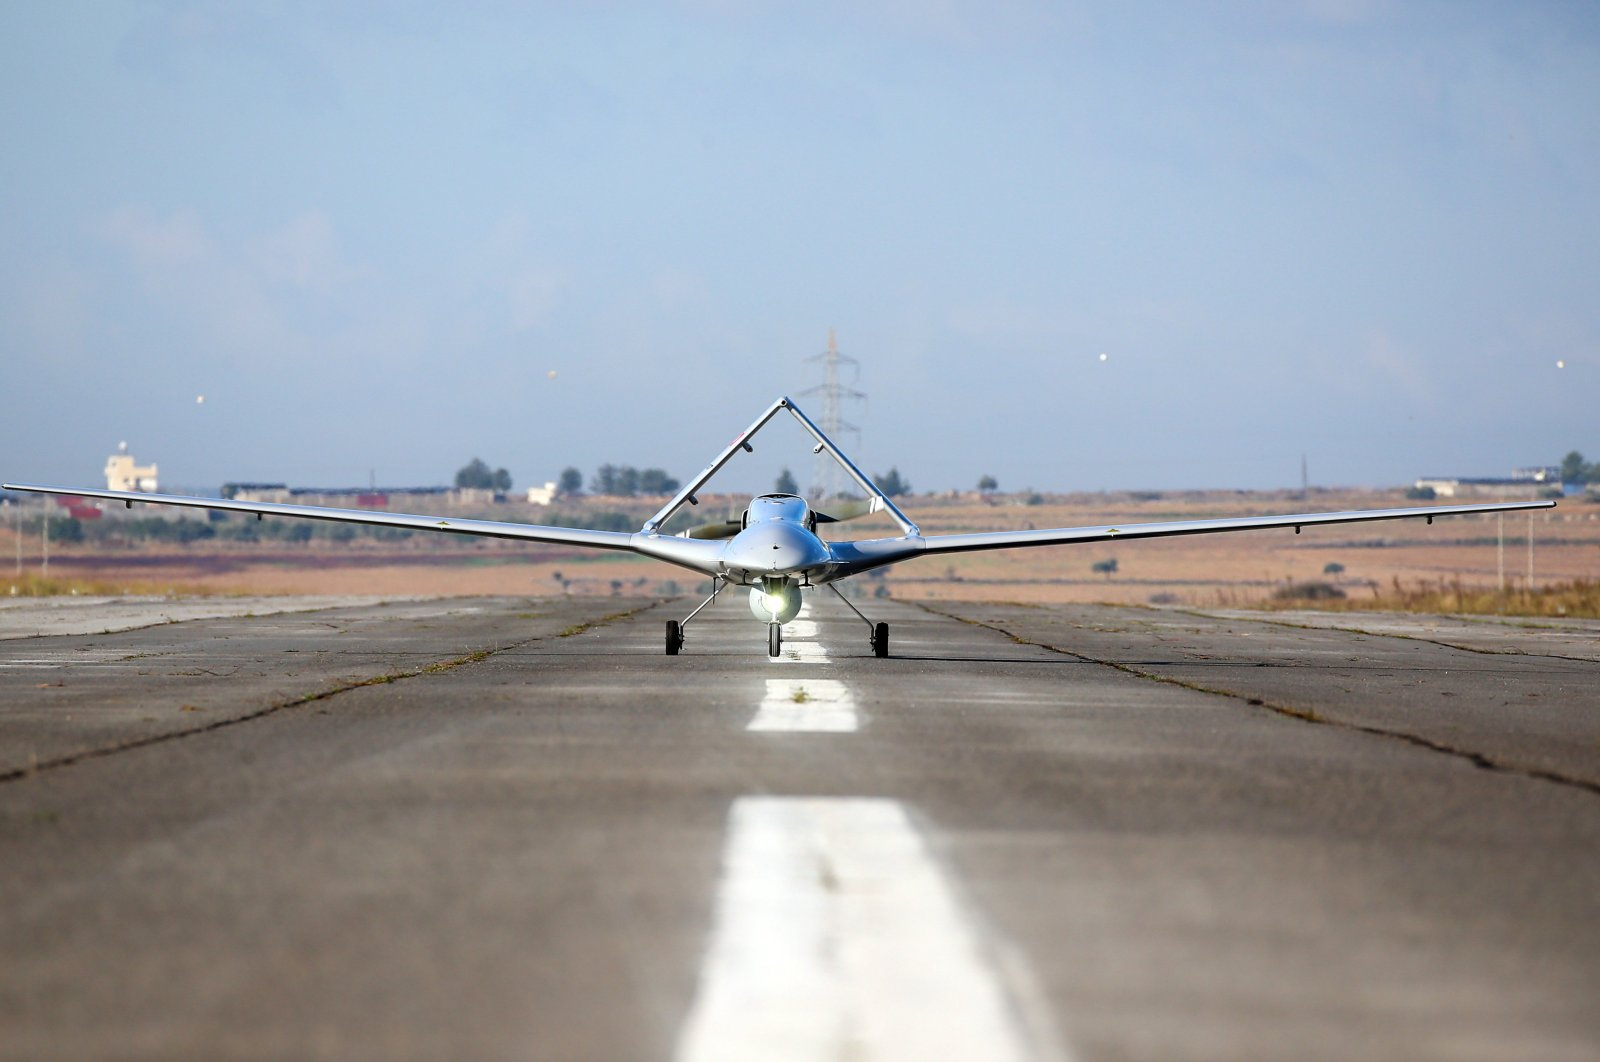 The Bayraktar TB2 drone at Geçitkale Airport in the Turkish Republic of Northern Cyprus, Dec. 16, 2019. (AA Photo)